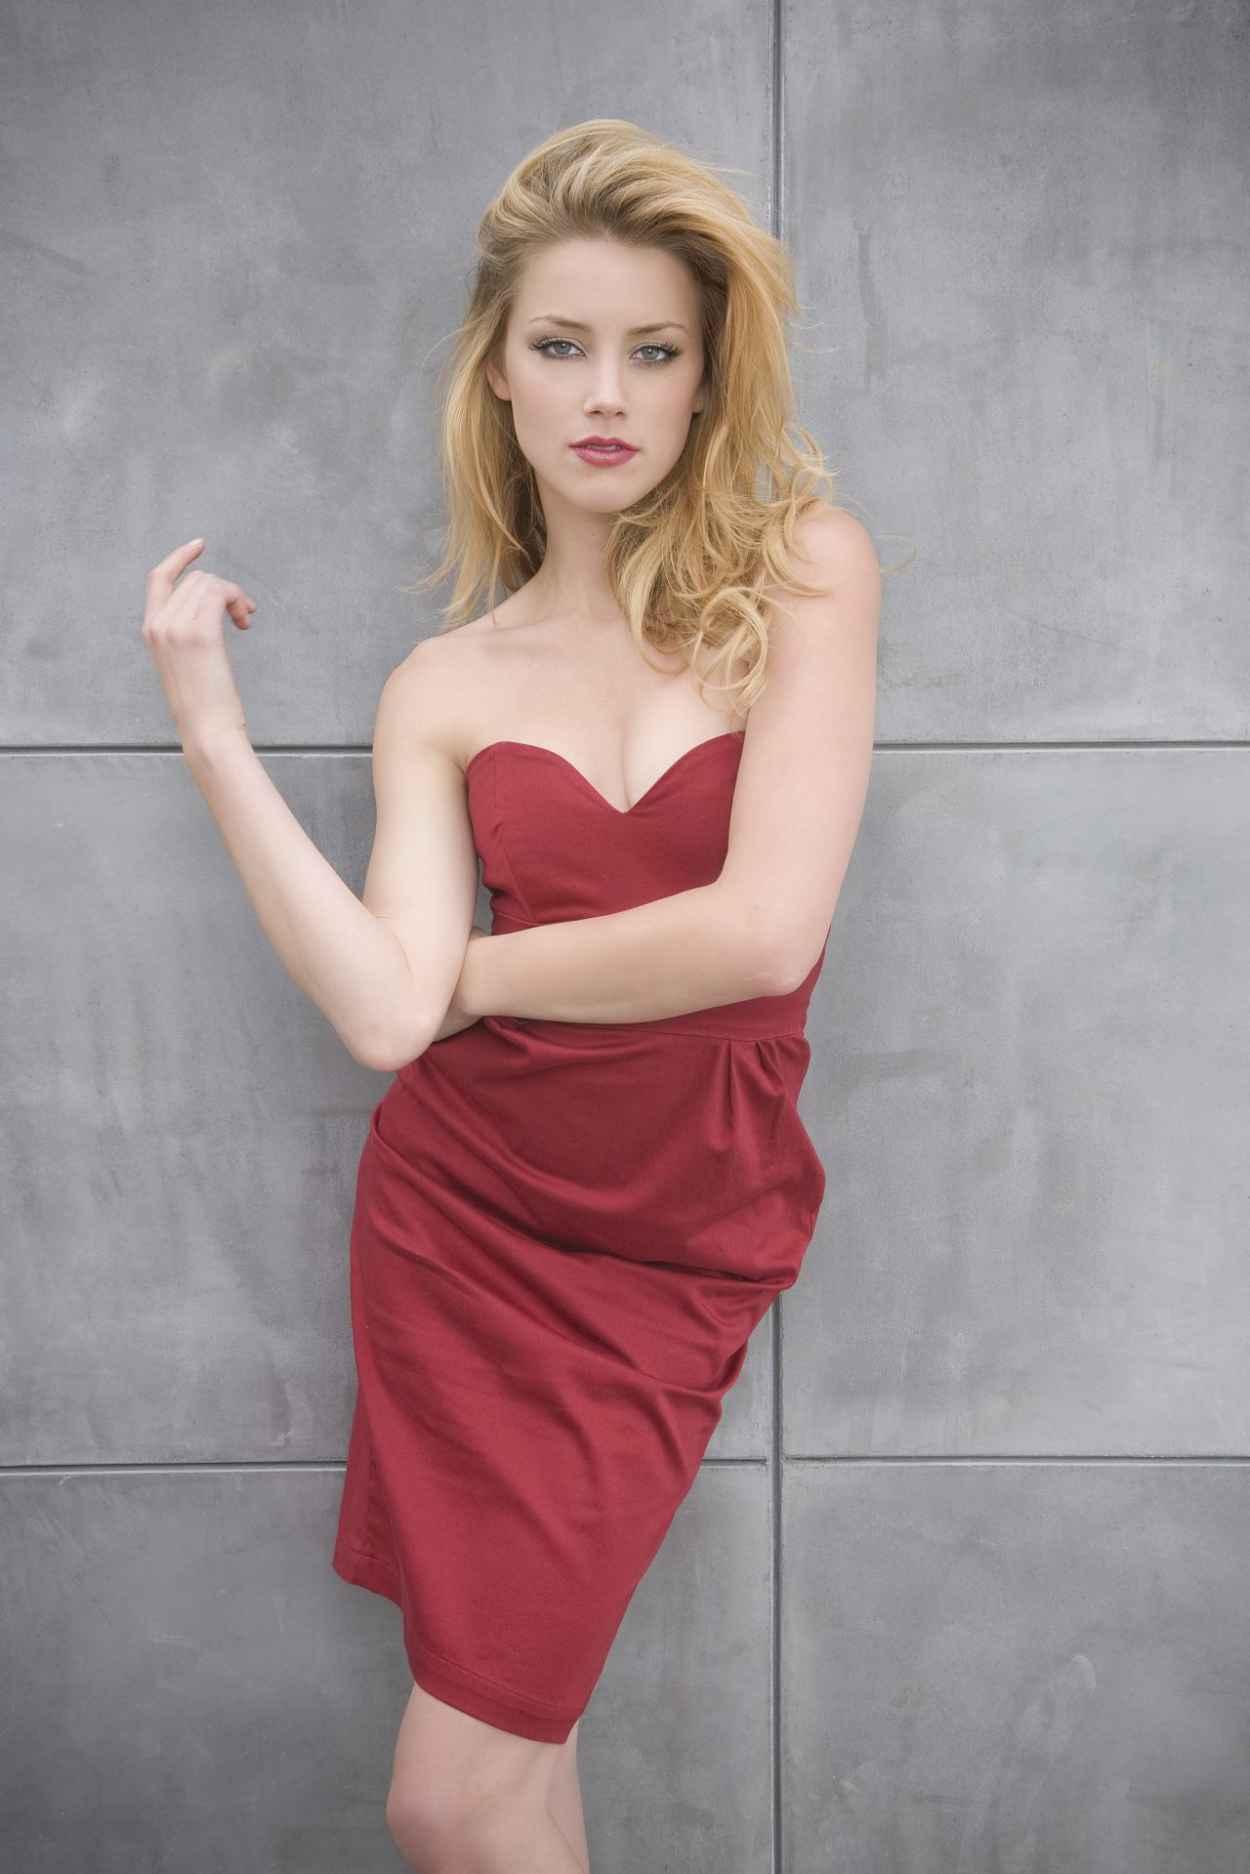 Amber Heard - Bobby Quillard Photoshoot for SNL - November 2015-1